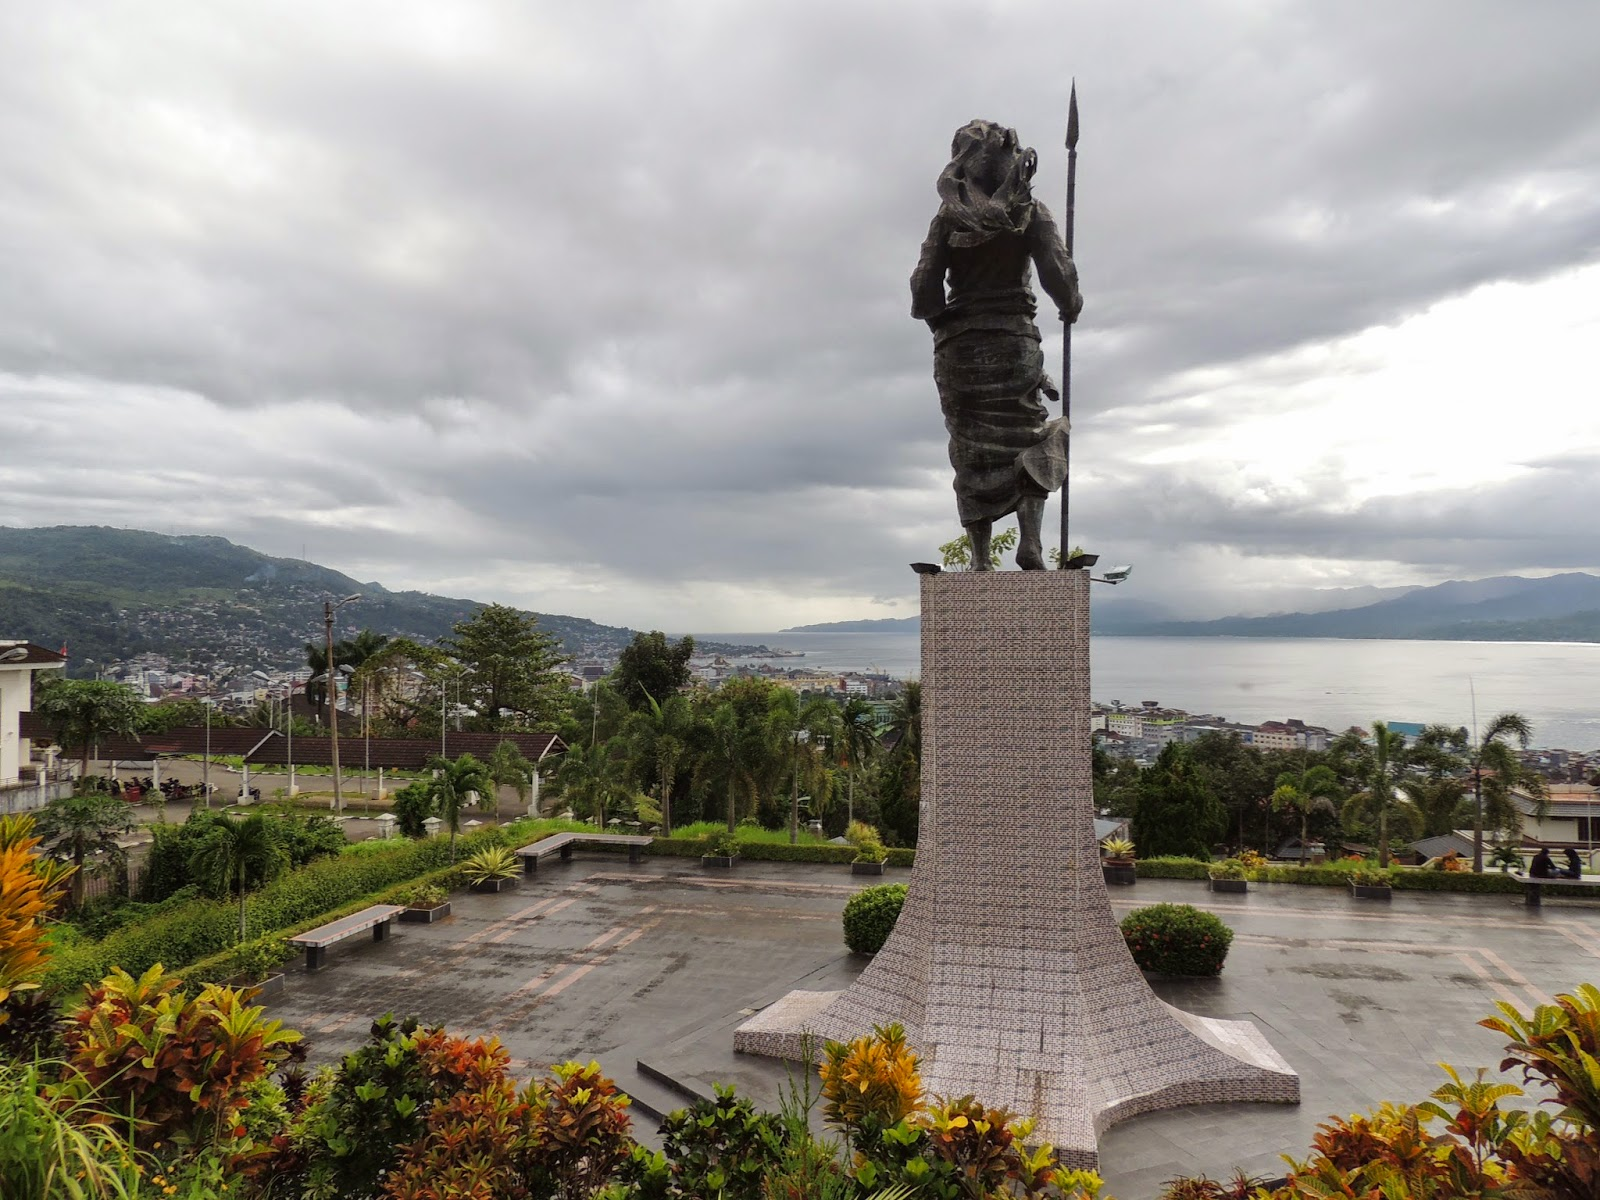 Benteng Ferangi Wisata Bersejarah Ambon Vebma Victoria Kota